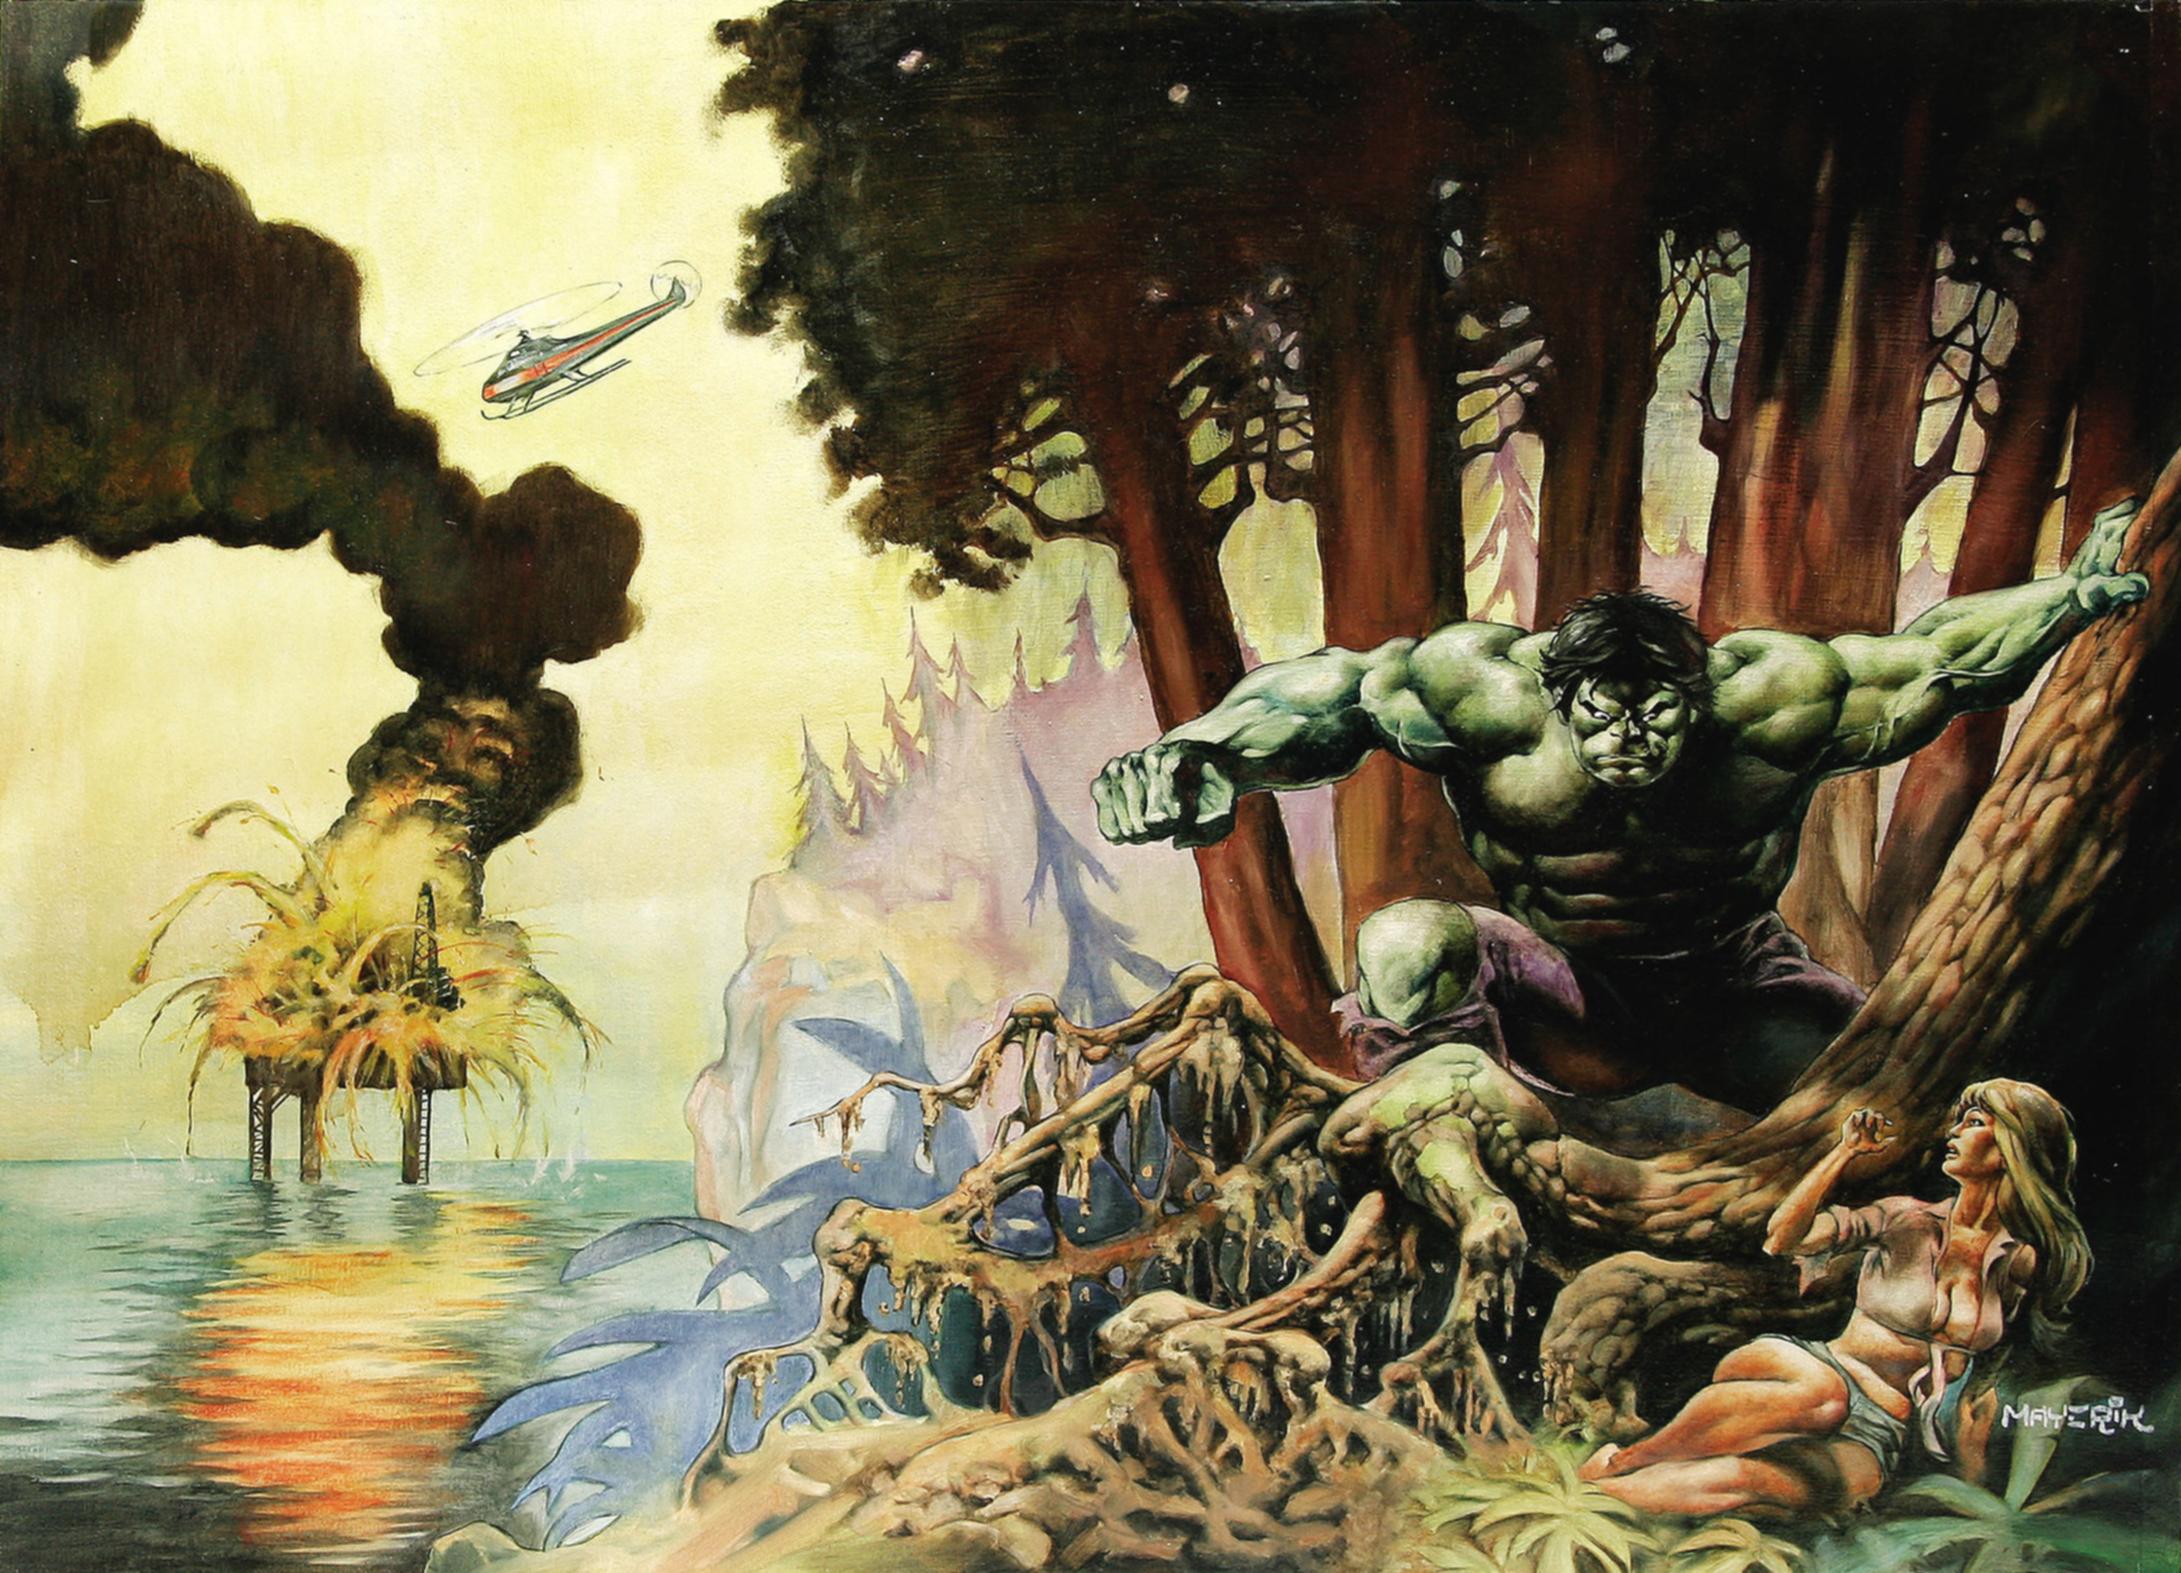 General 2181x1573 Val Mayerik Hulk helicopter oil platform women swamp painting explosion